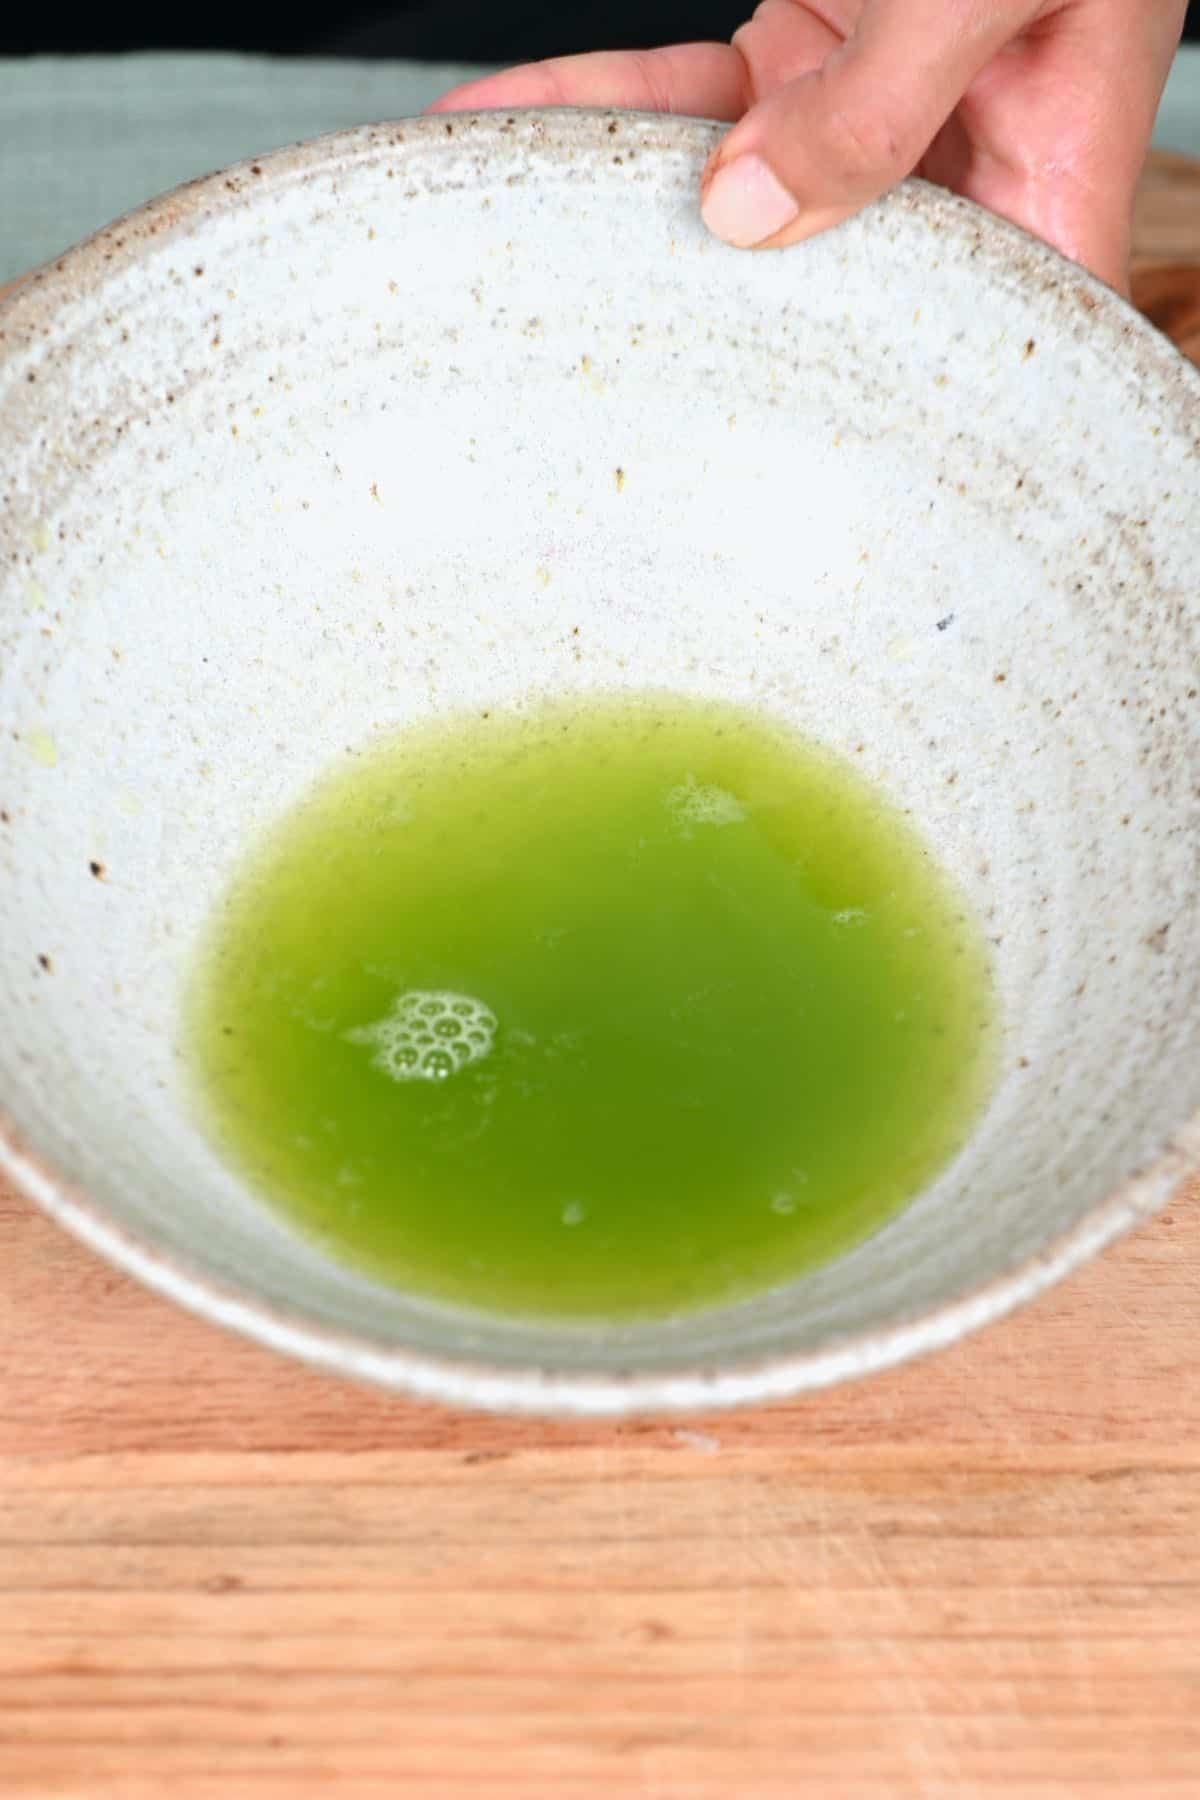 Liquid from zucchini